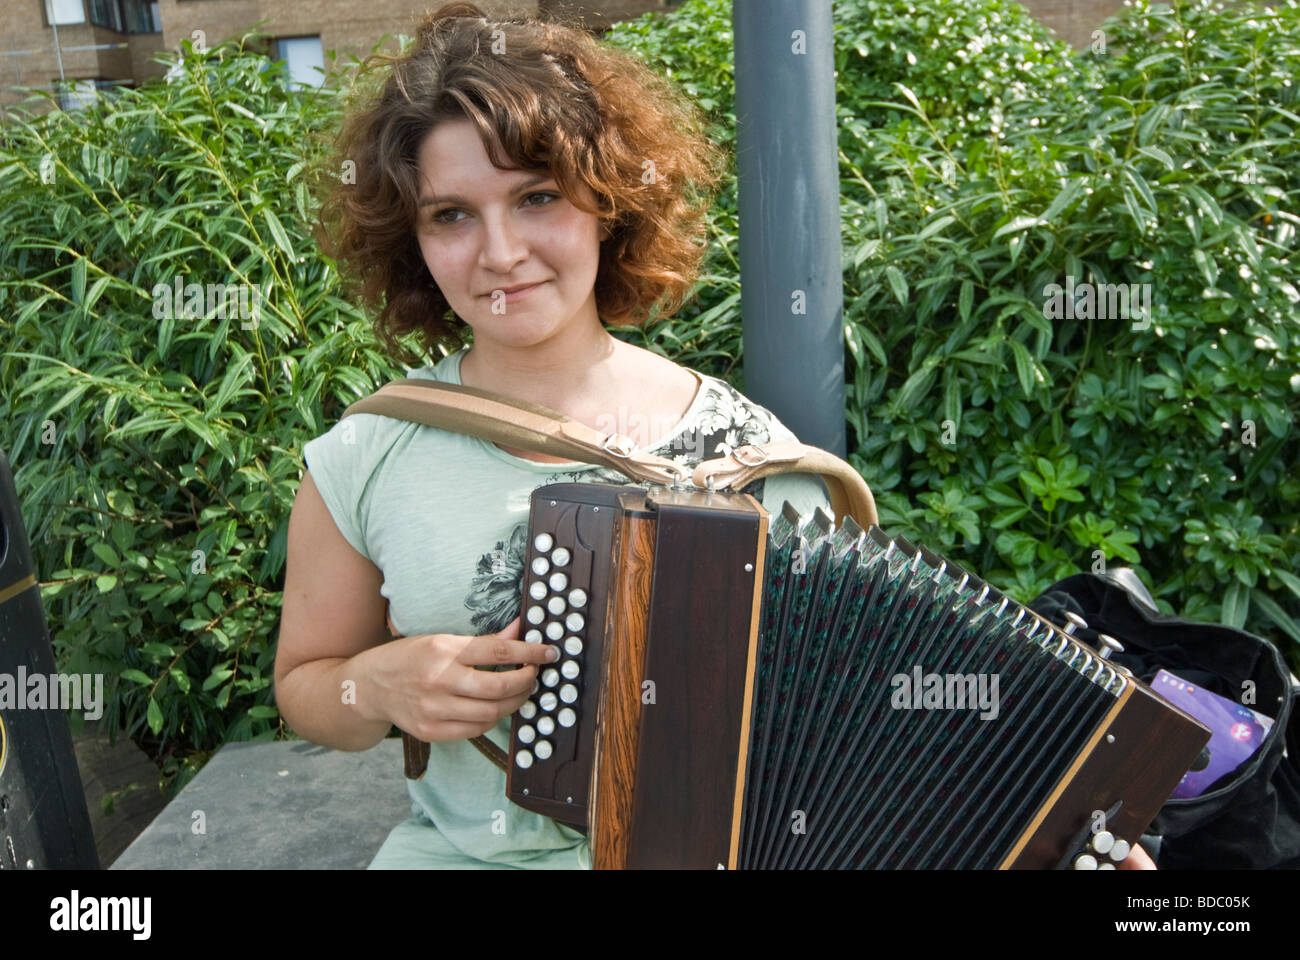 FEMALE STREET MUSICIAN PLAYING ACCORDION - Stock Image